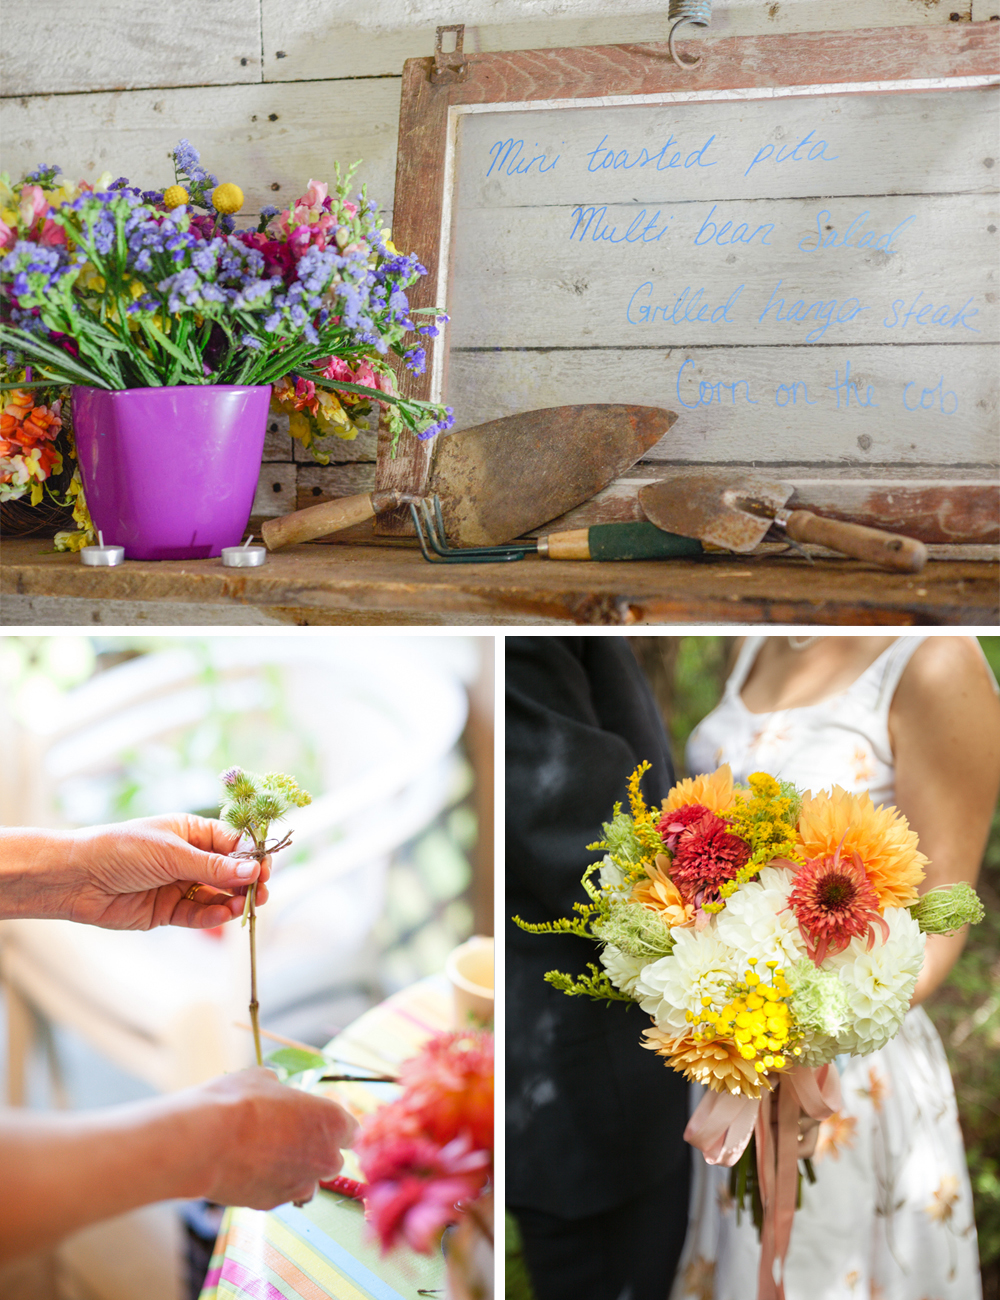 Handmade DIY wedding flowers